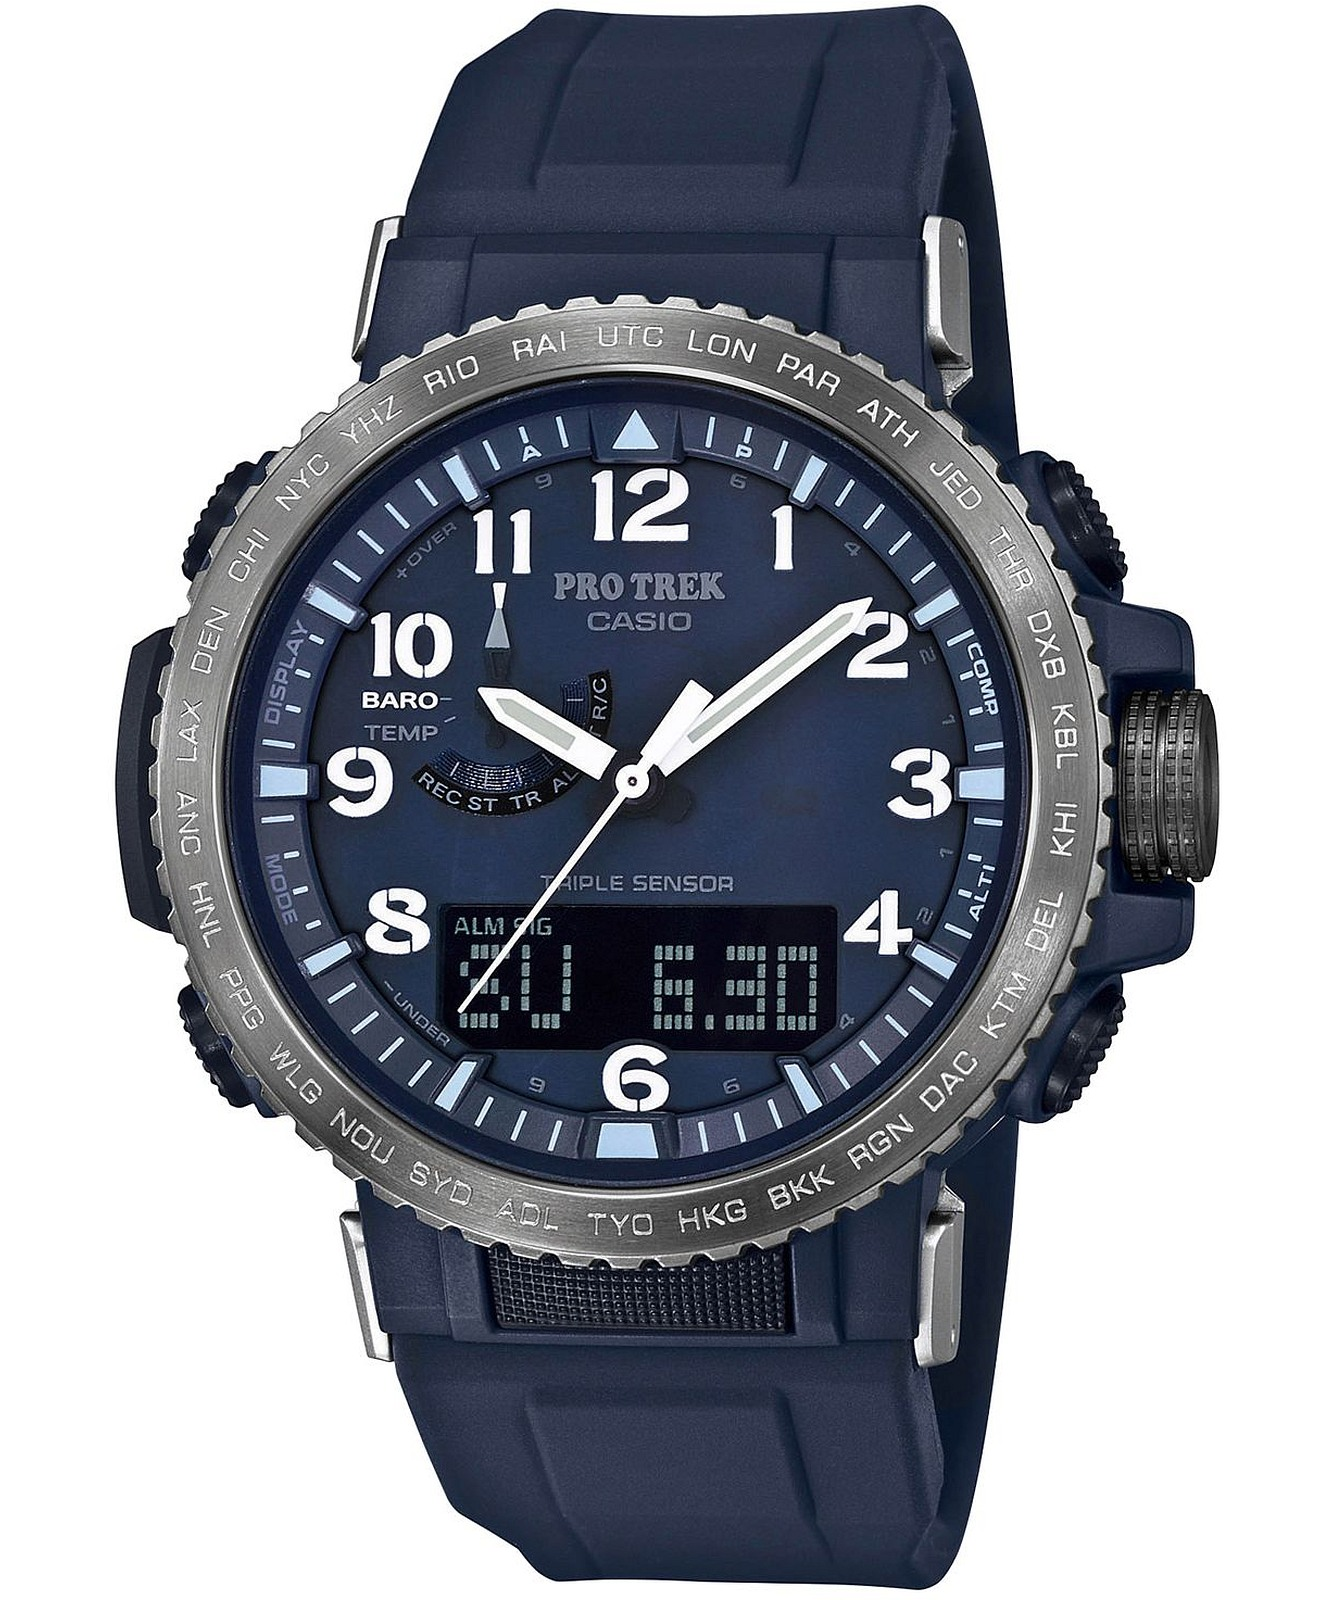 zegarek-meski-protrek-slim-design-radio-solar-prw-50yfe-2aer